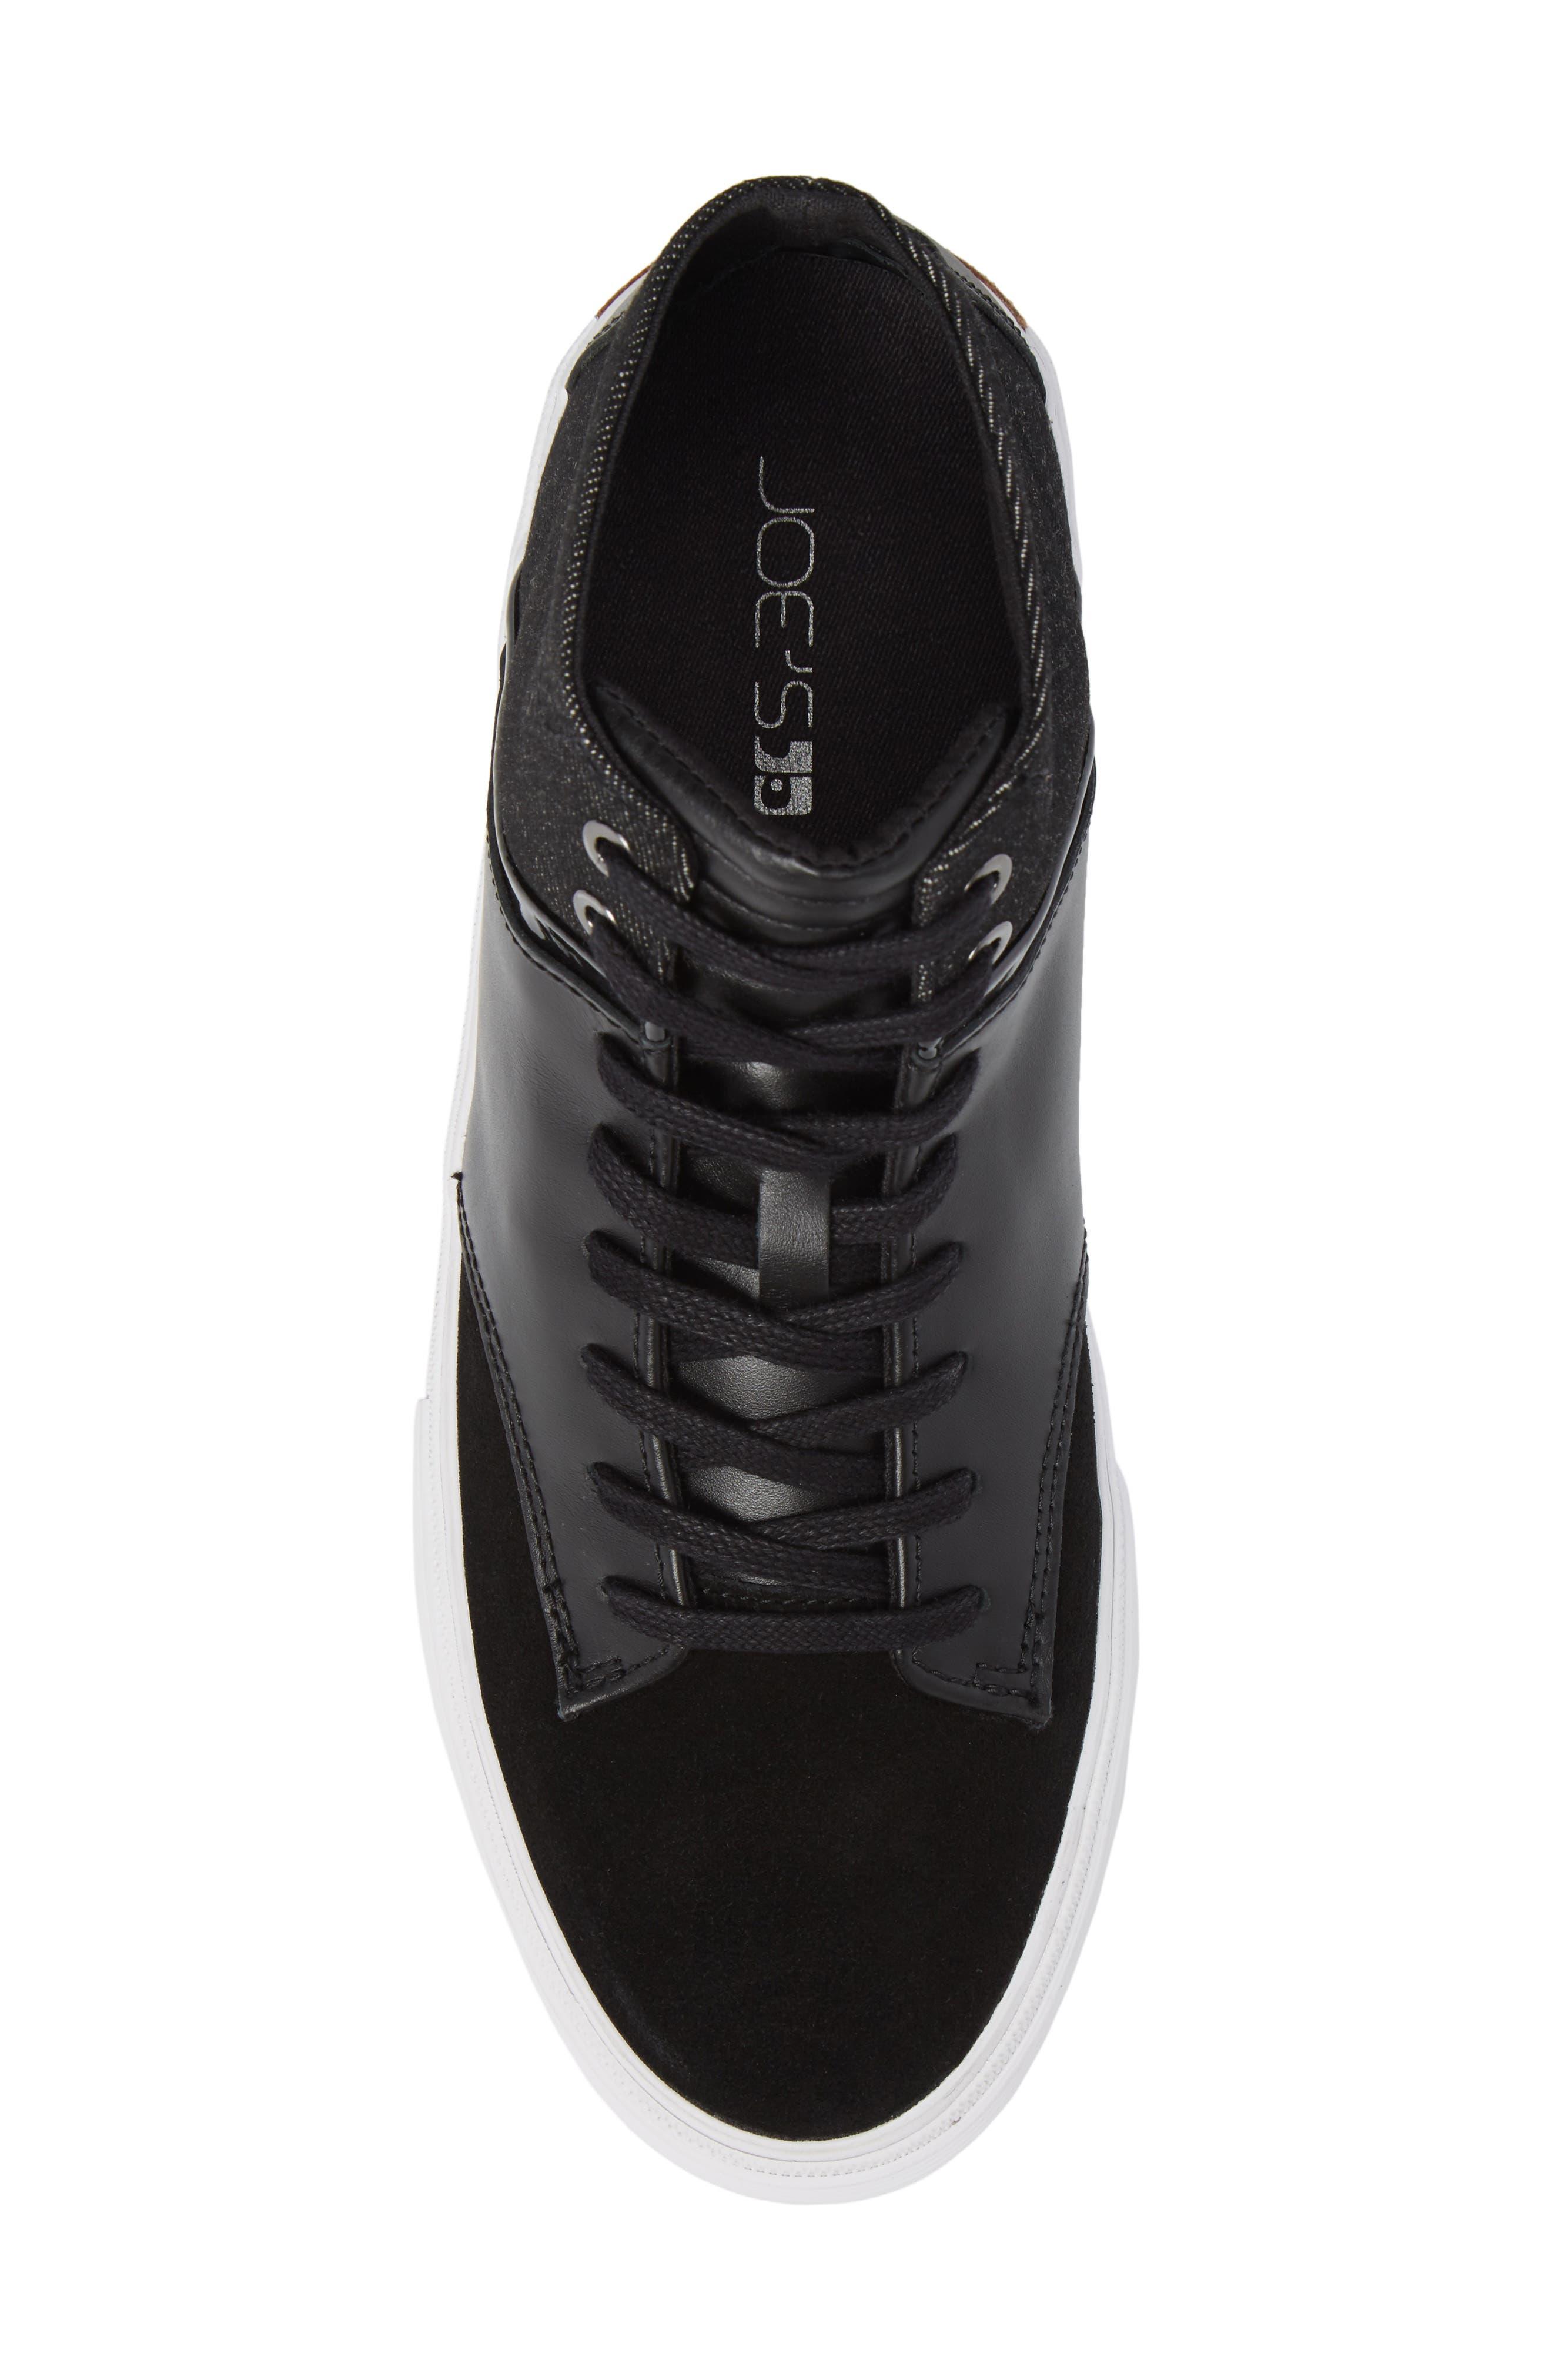 Joe Mac High Top Sneaker,                             Alternate thumbnail 5, color,                             001